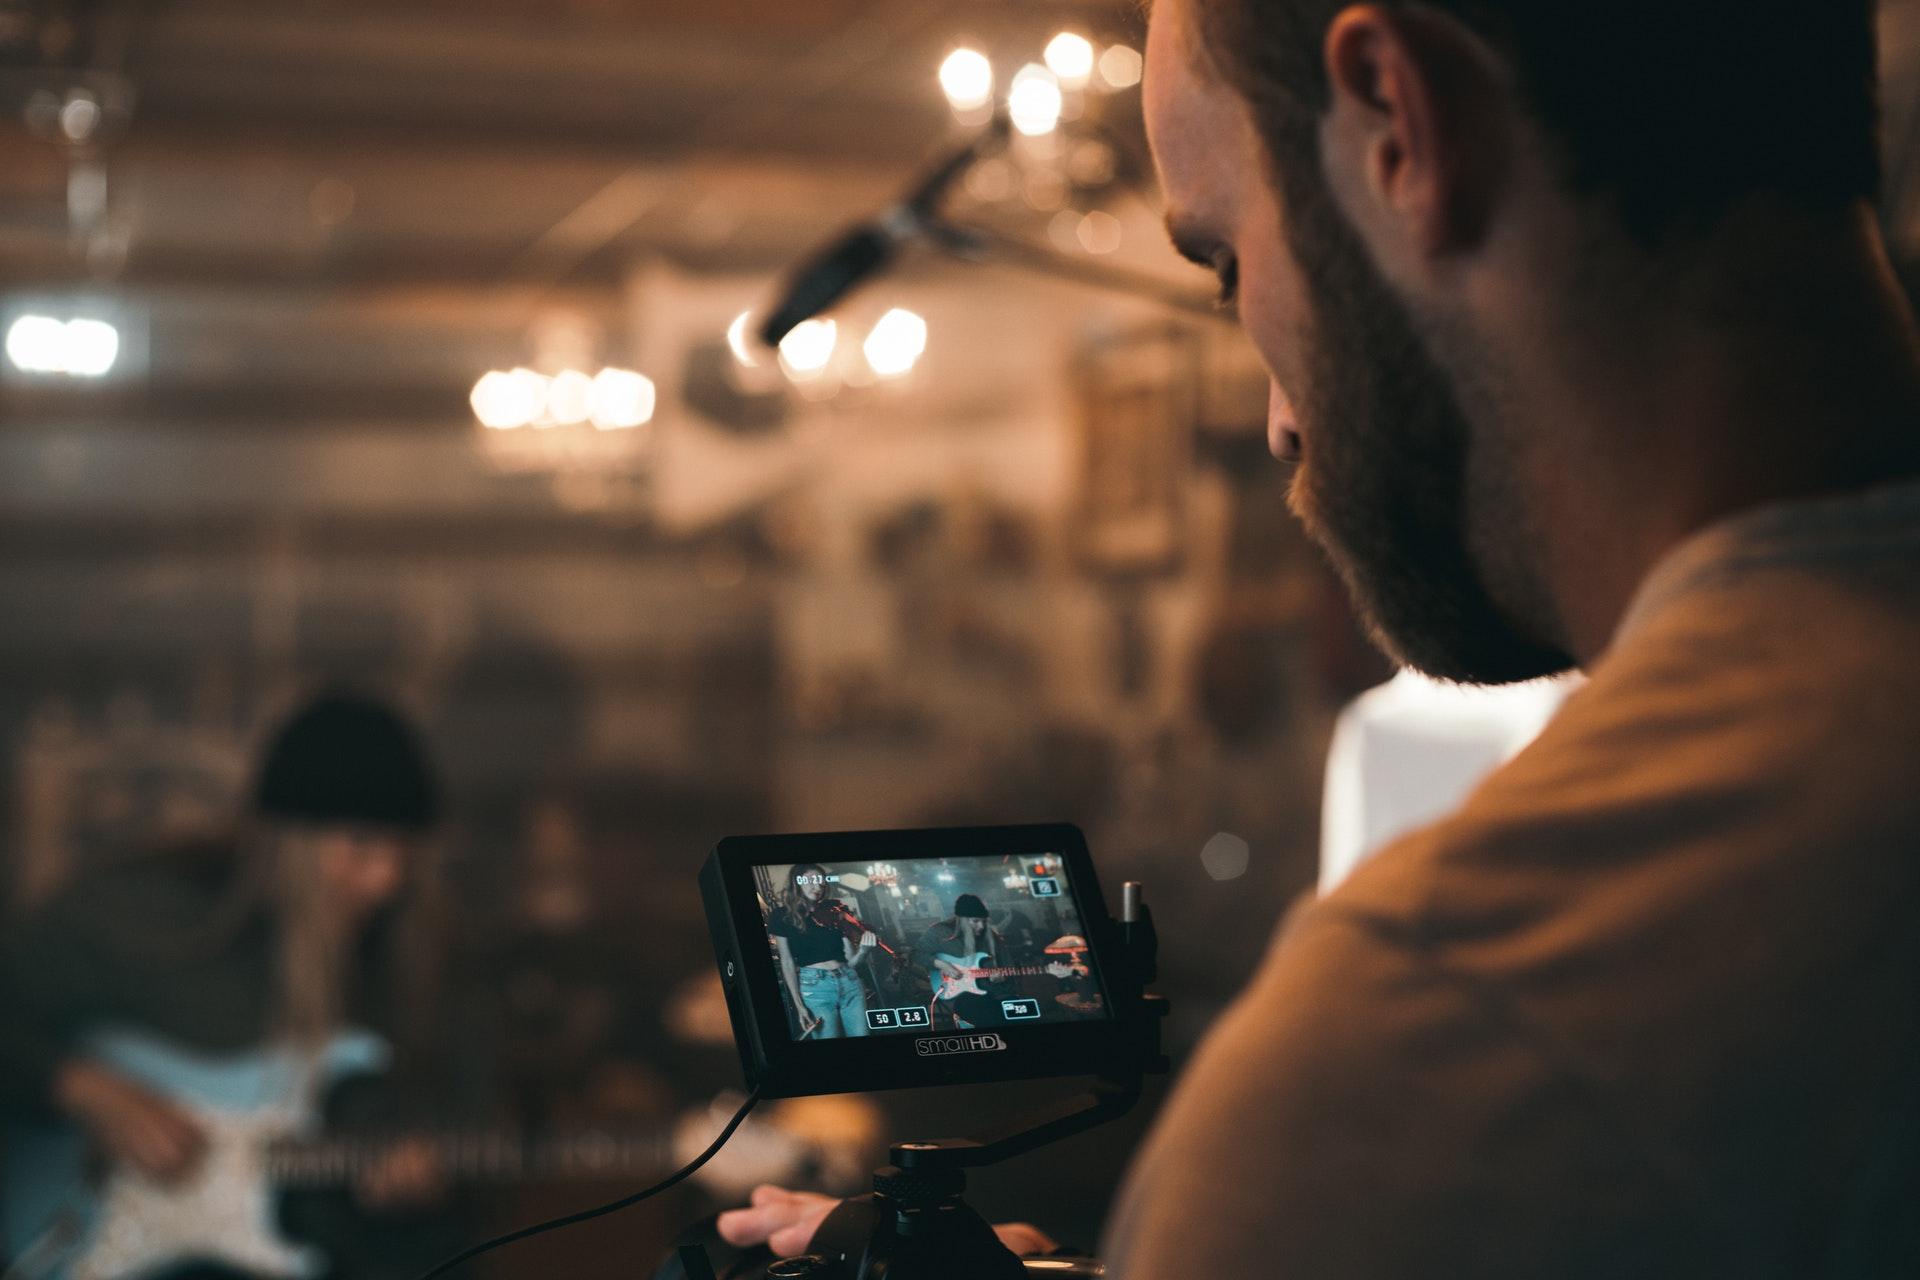 man-recording-video-2510429